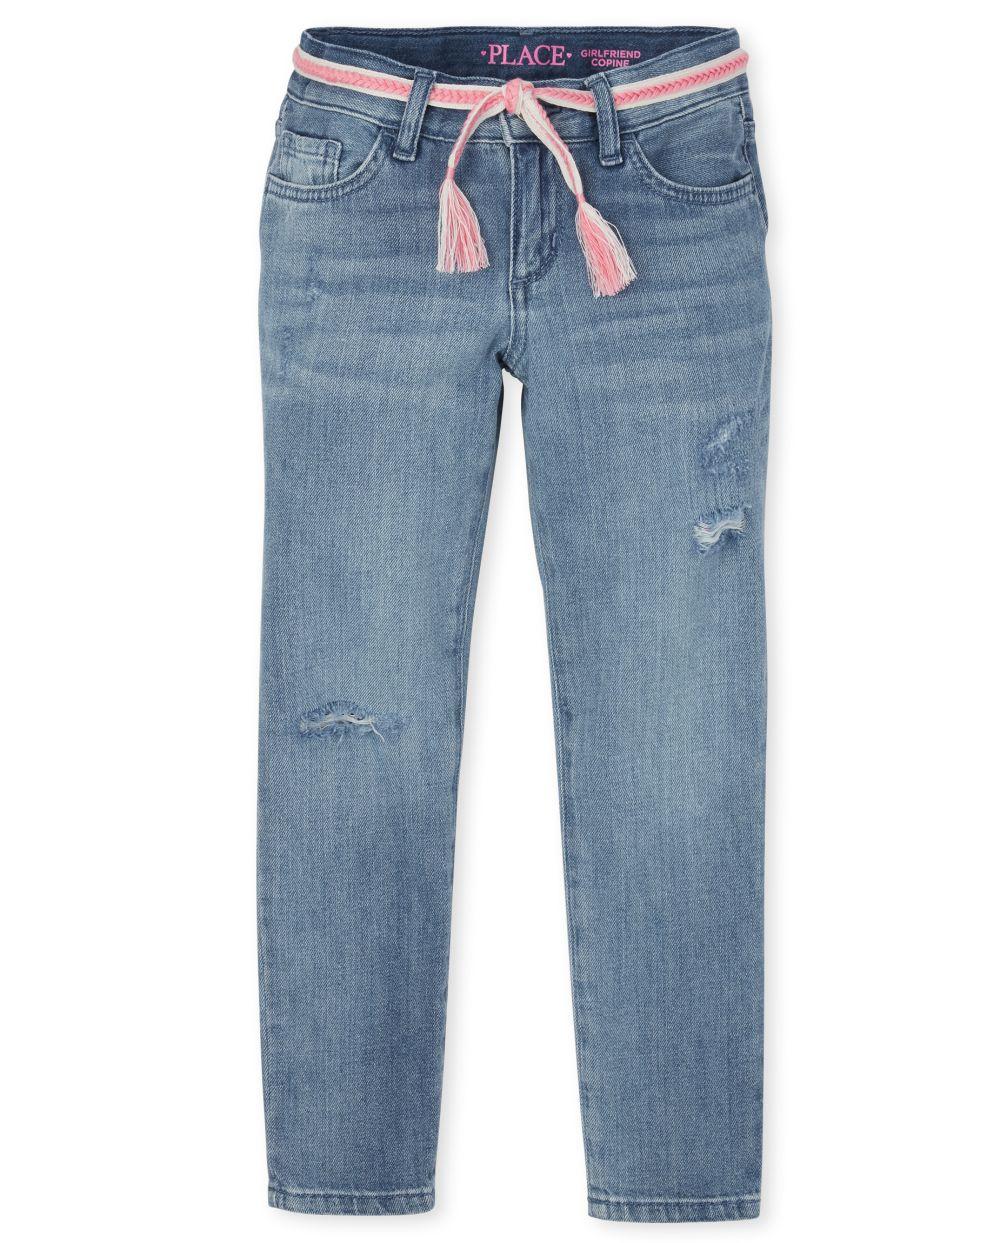 Girls Distressed Denim Girlfriend Jeans